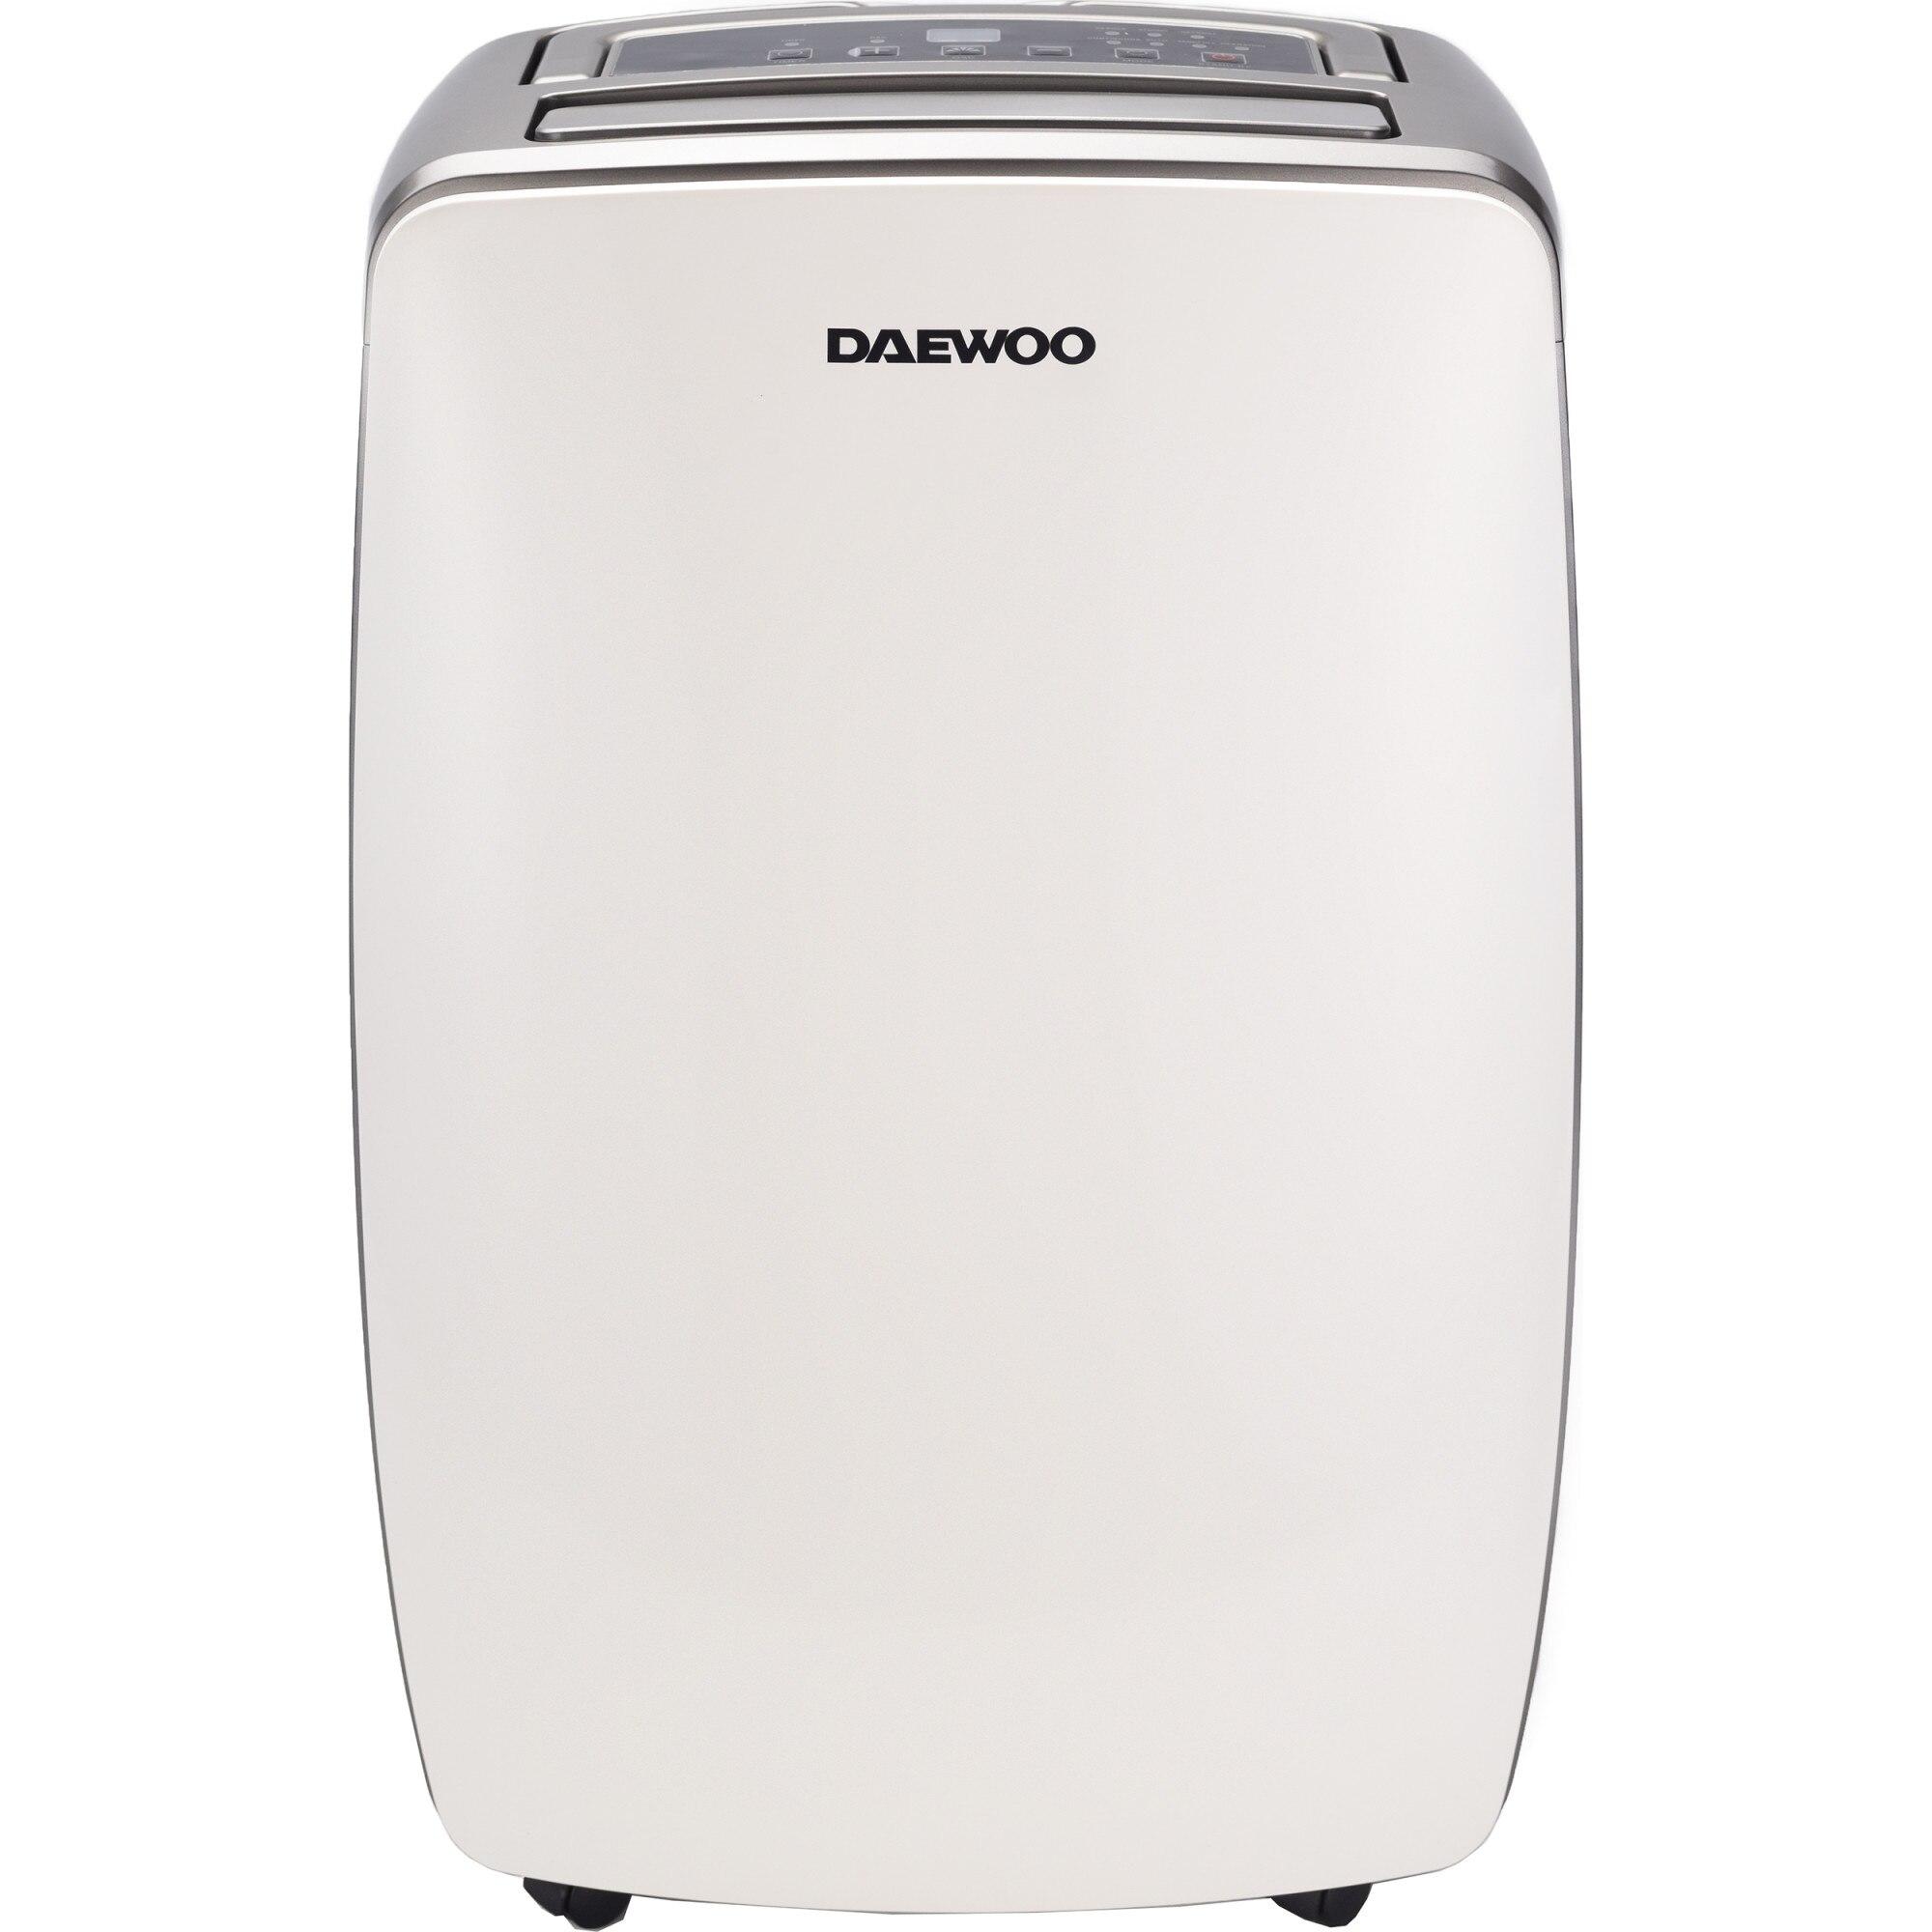 Fotografie Dezumidificator Daewoo DDH20W, 20 l/24h, 350 W, capacitate recipient 5.5 litri, filtru lavabil, timer 24h, suprafata dezumidificare 40 mp, display Led